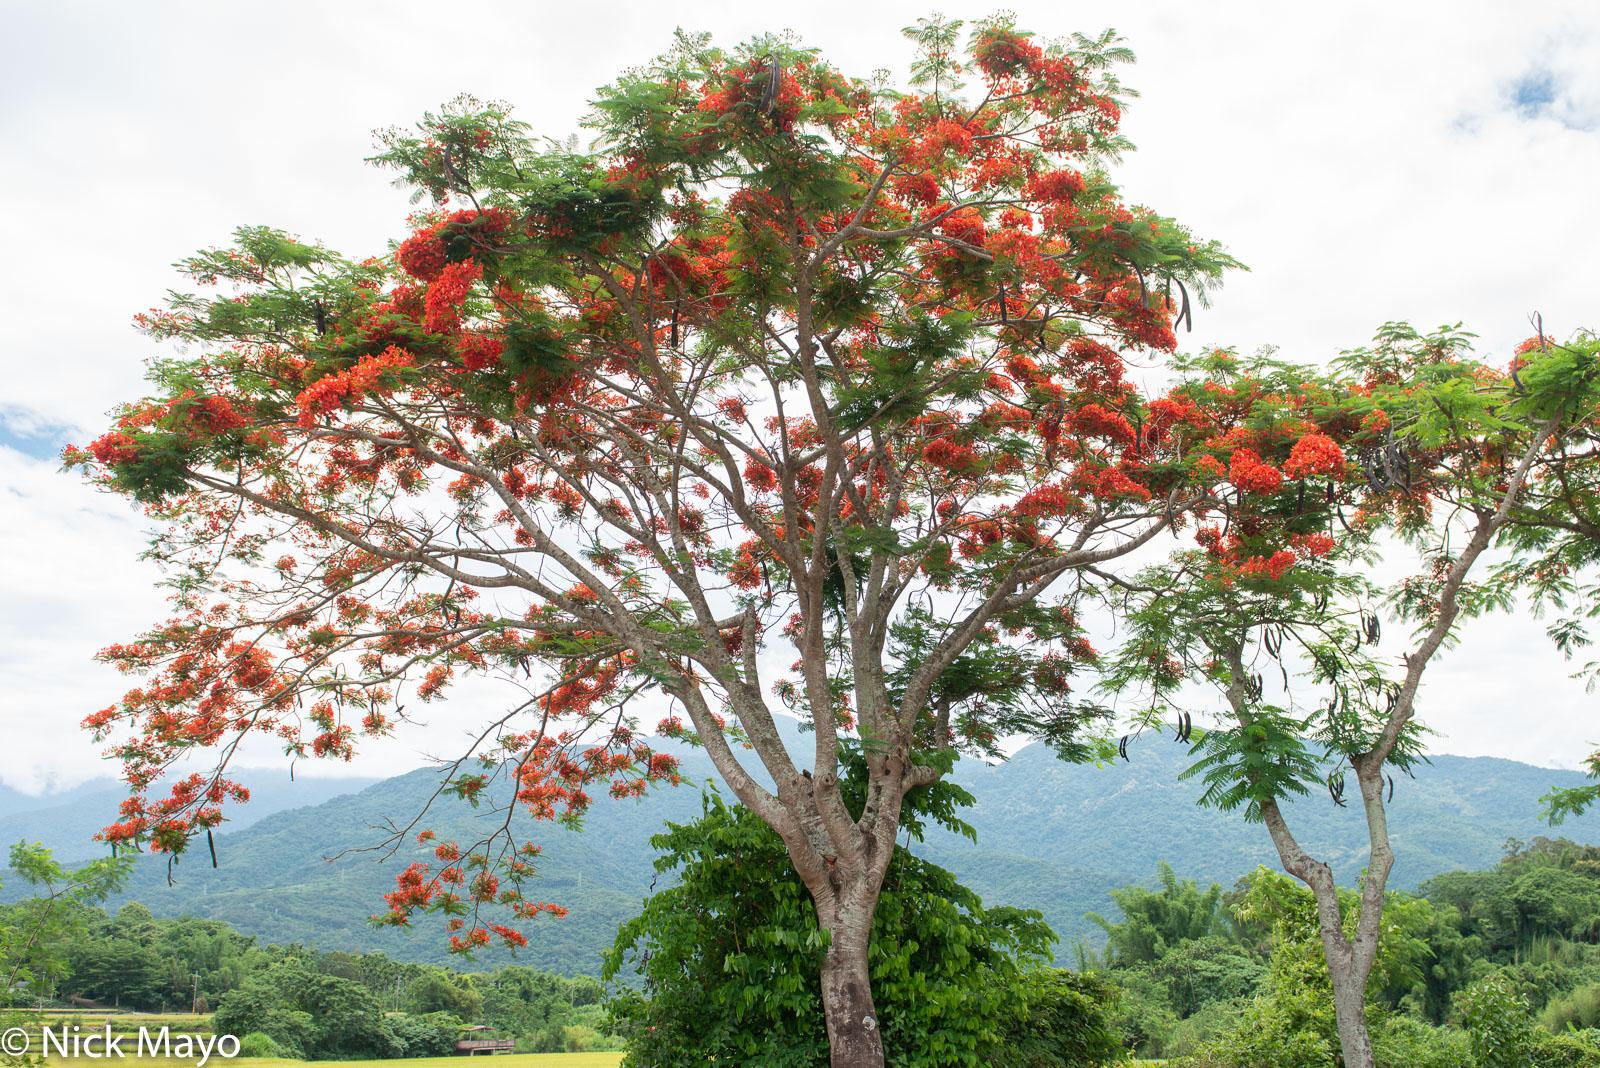 A royal poinciana in bloom near Fuli.